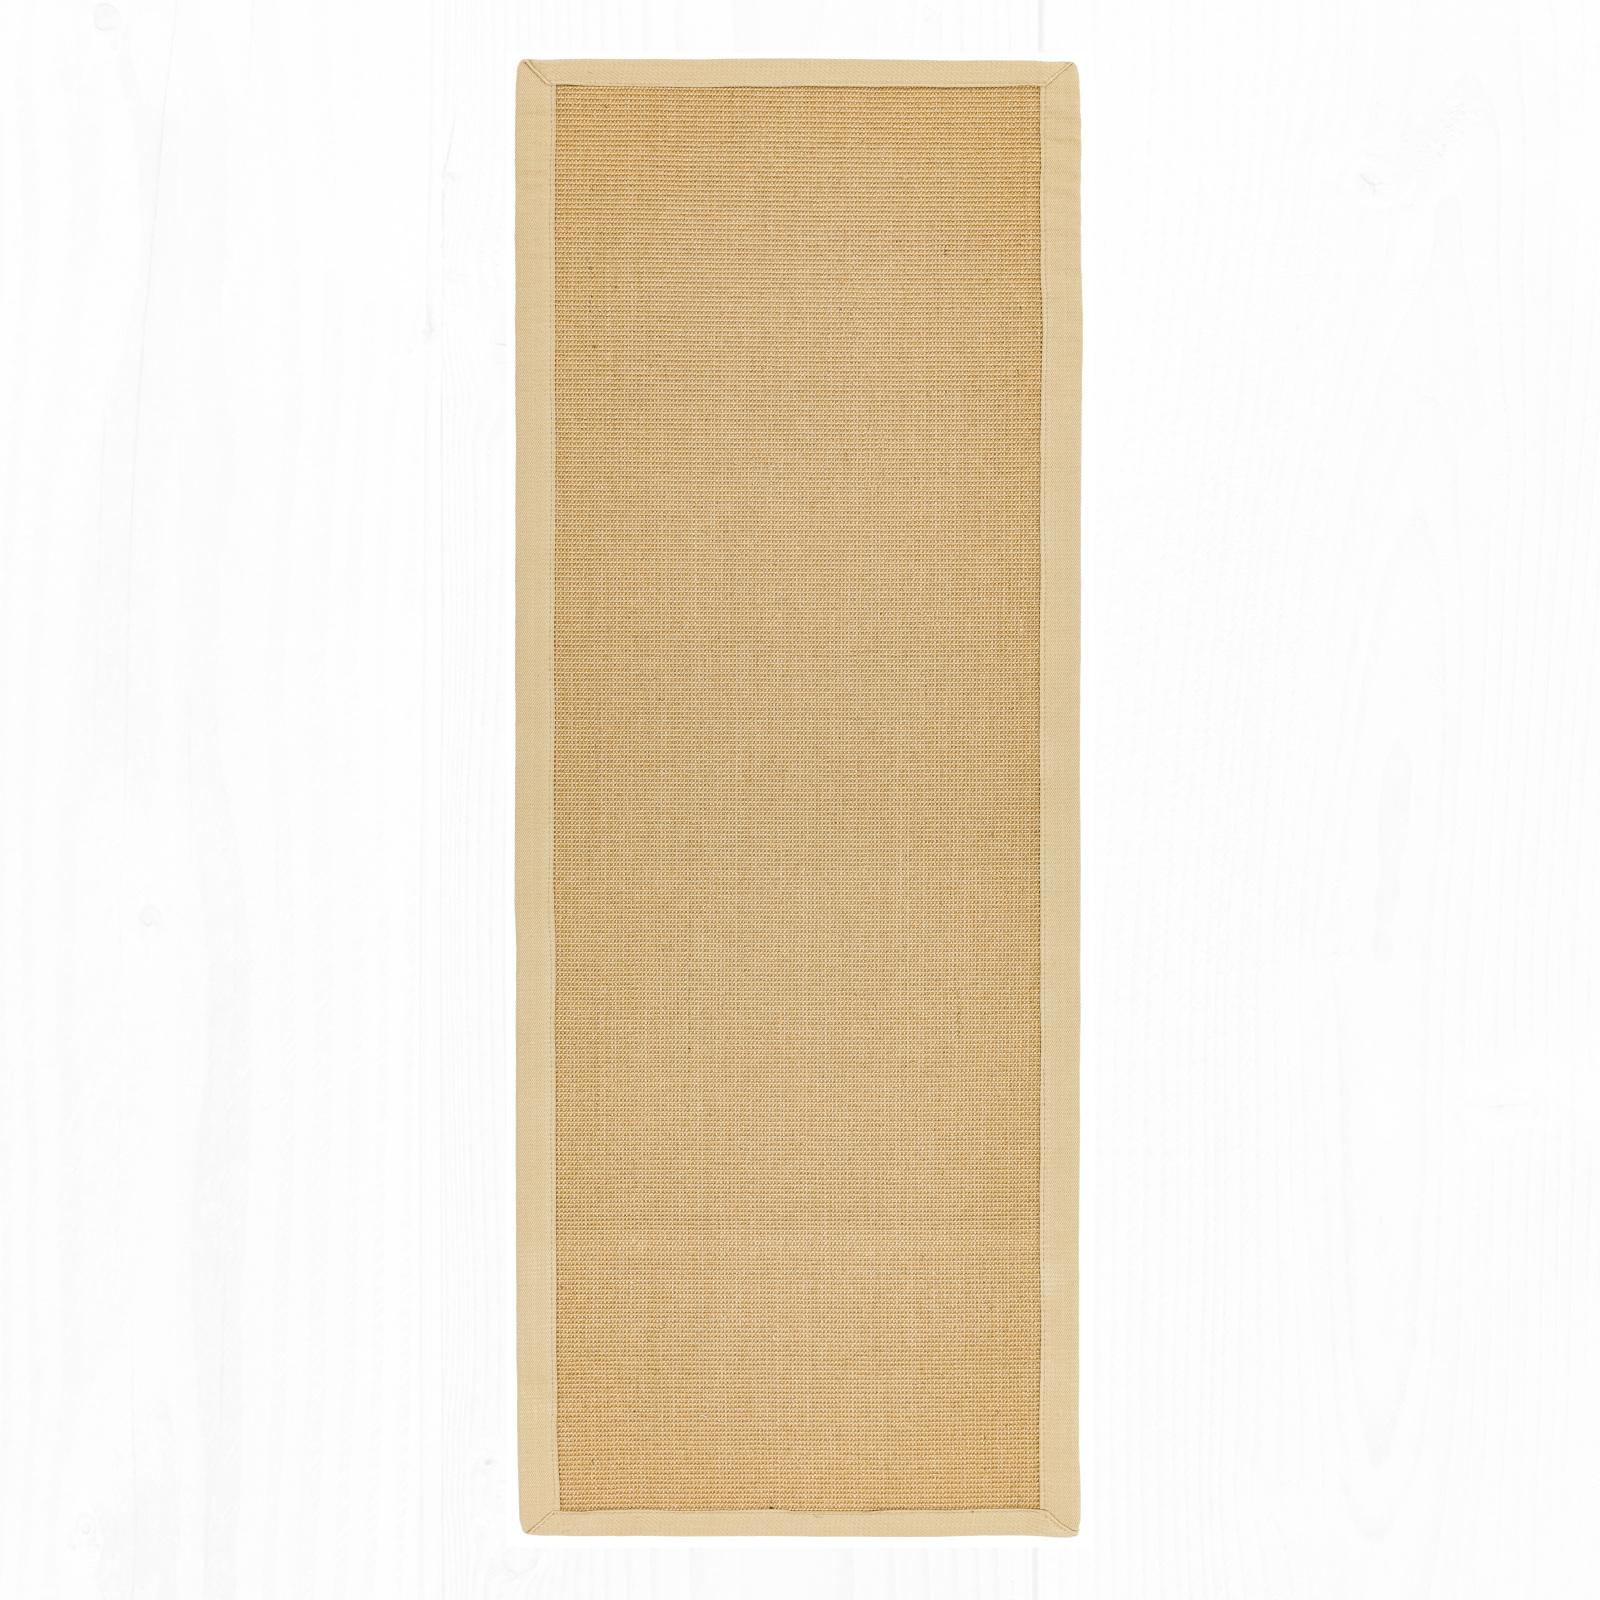 Sisal - Linen/Linen